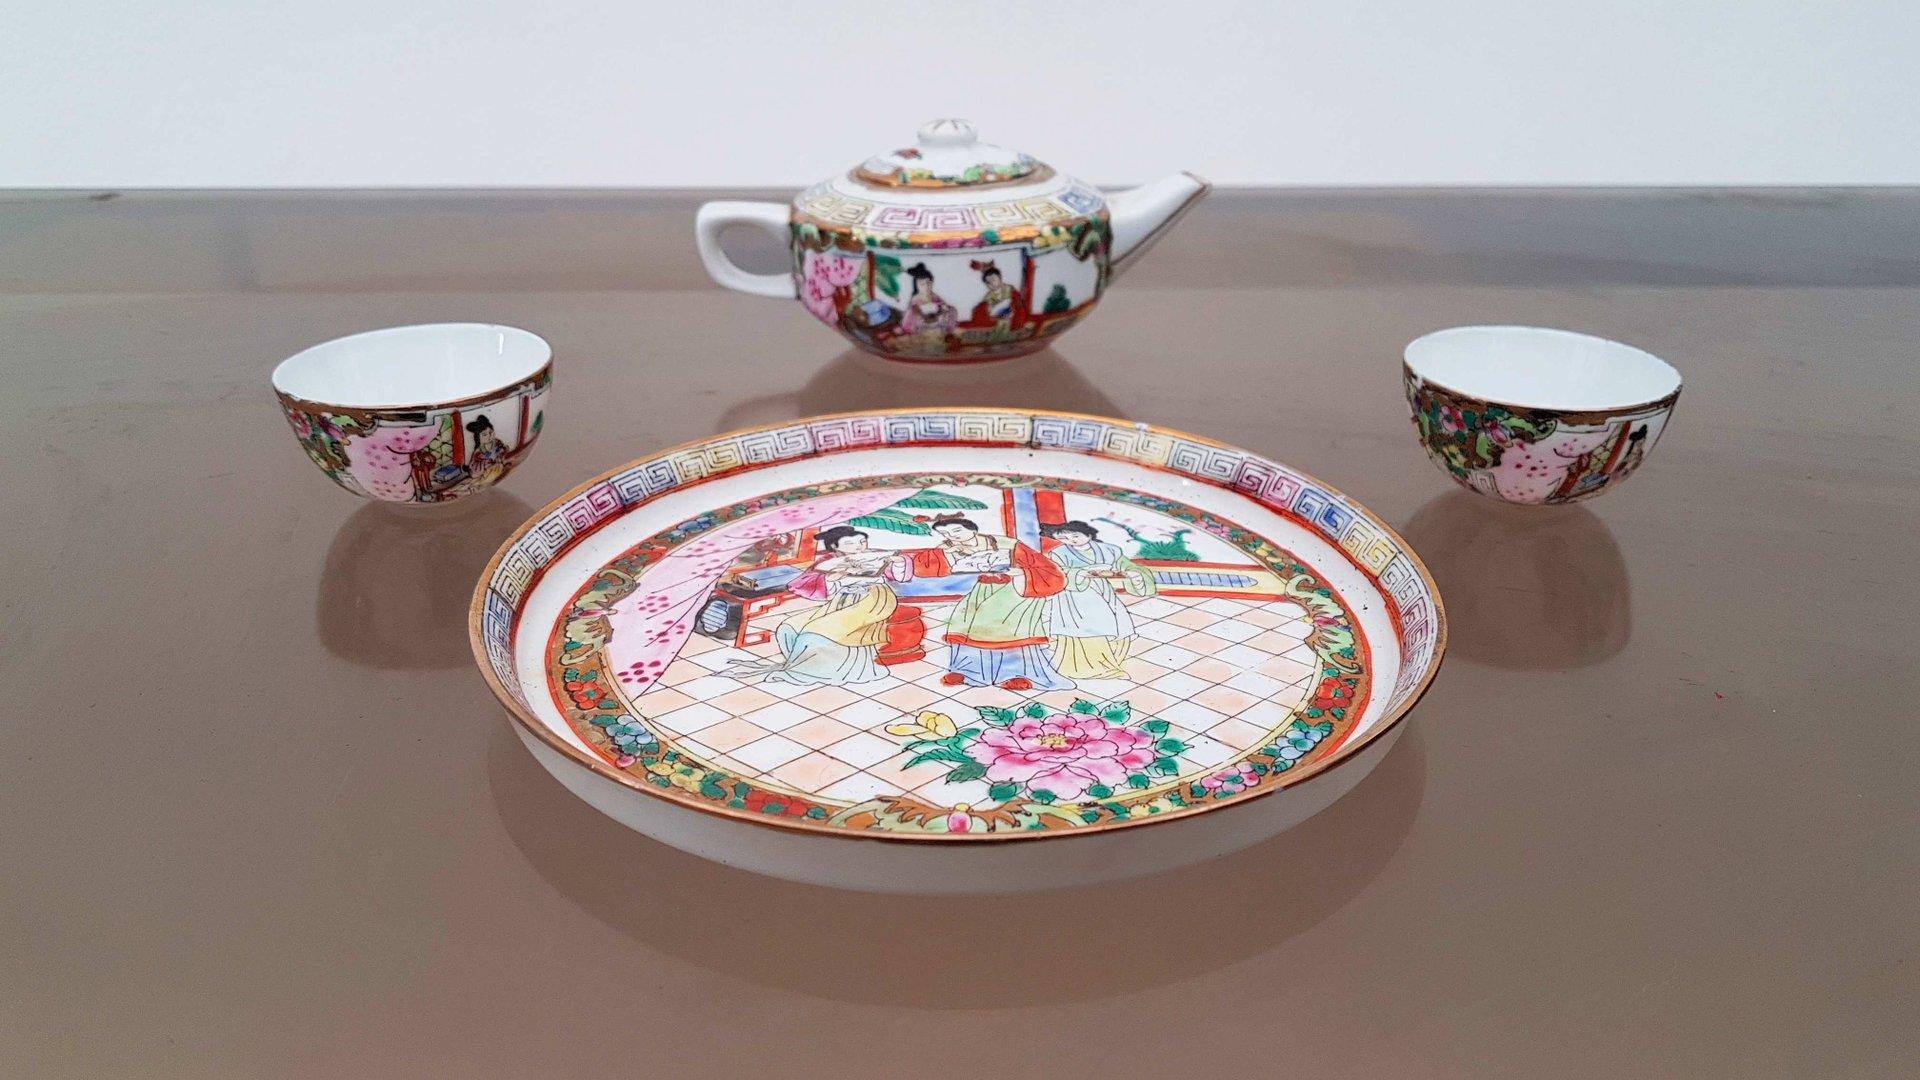 19th Century Chinese Porcelain Tea Set & 19th Century Chinese Porcelain Tea Set for sale at Pamono